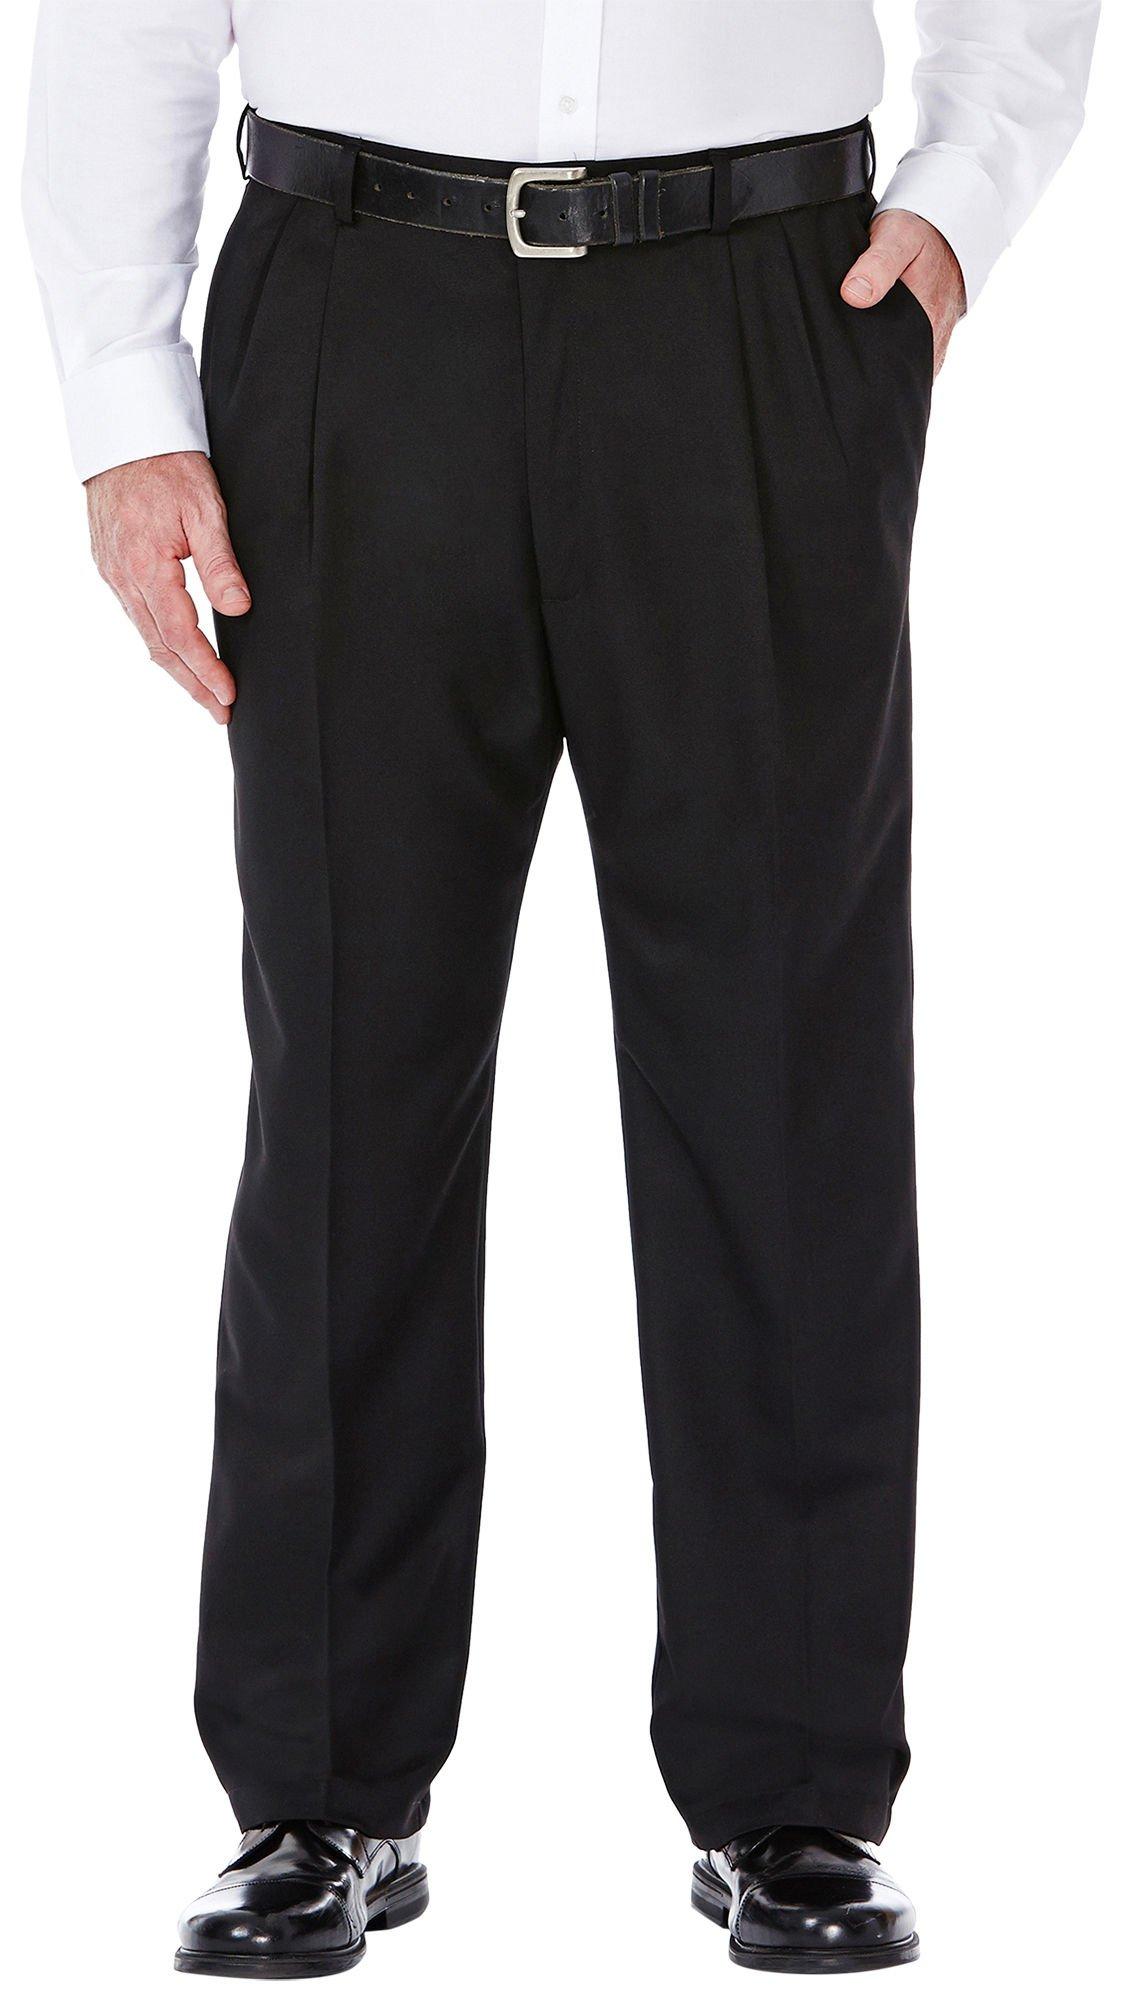 Haggar Men's Big-Tall Cool 18 Gabardine Hidden Expandable Waist Pleat Front Pant, Black, 60x30